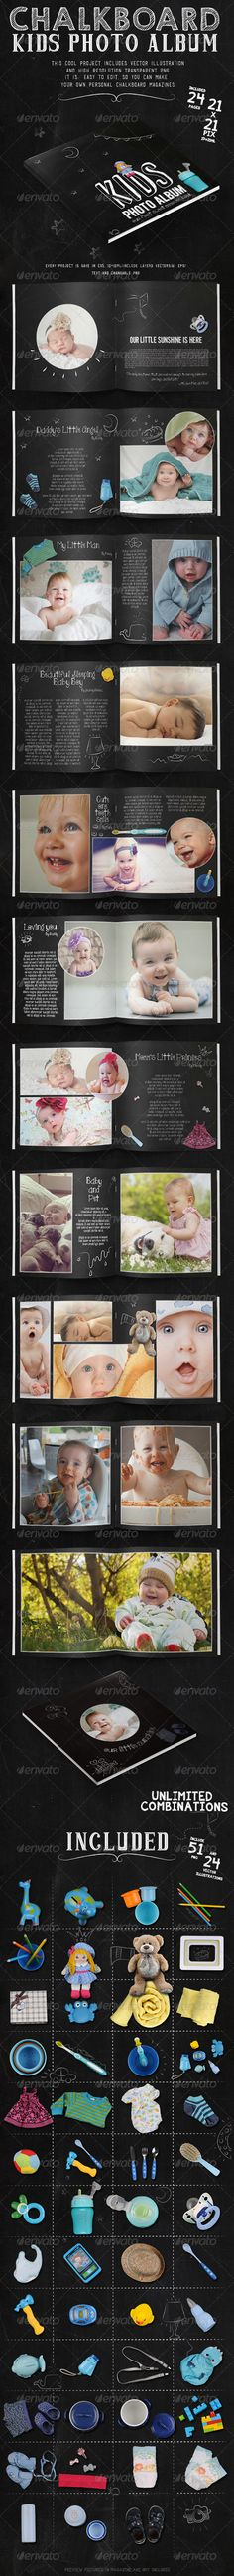 Kids Chalkboard Photo Album - Photo Albums Print Templates